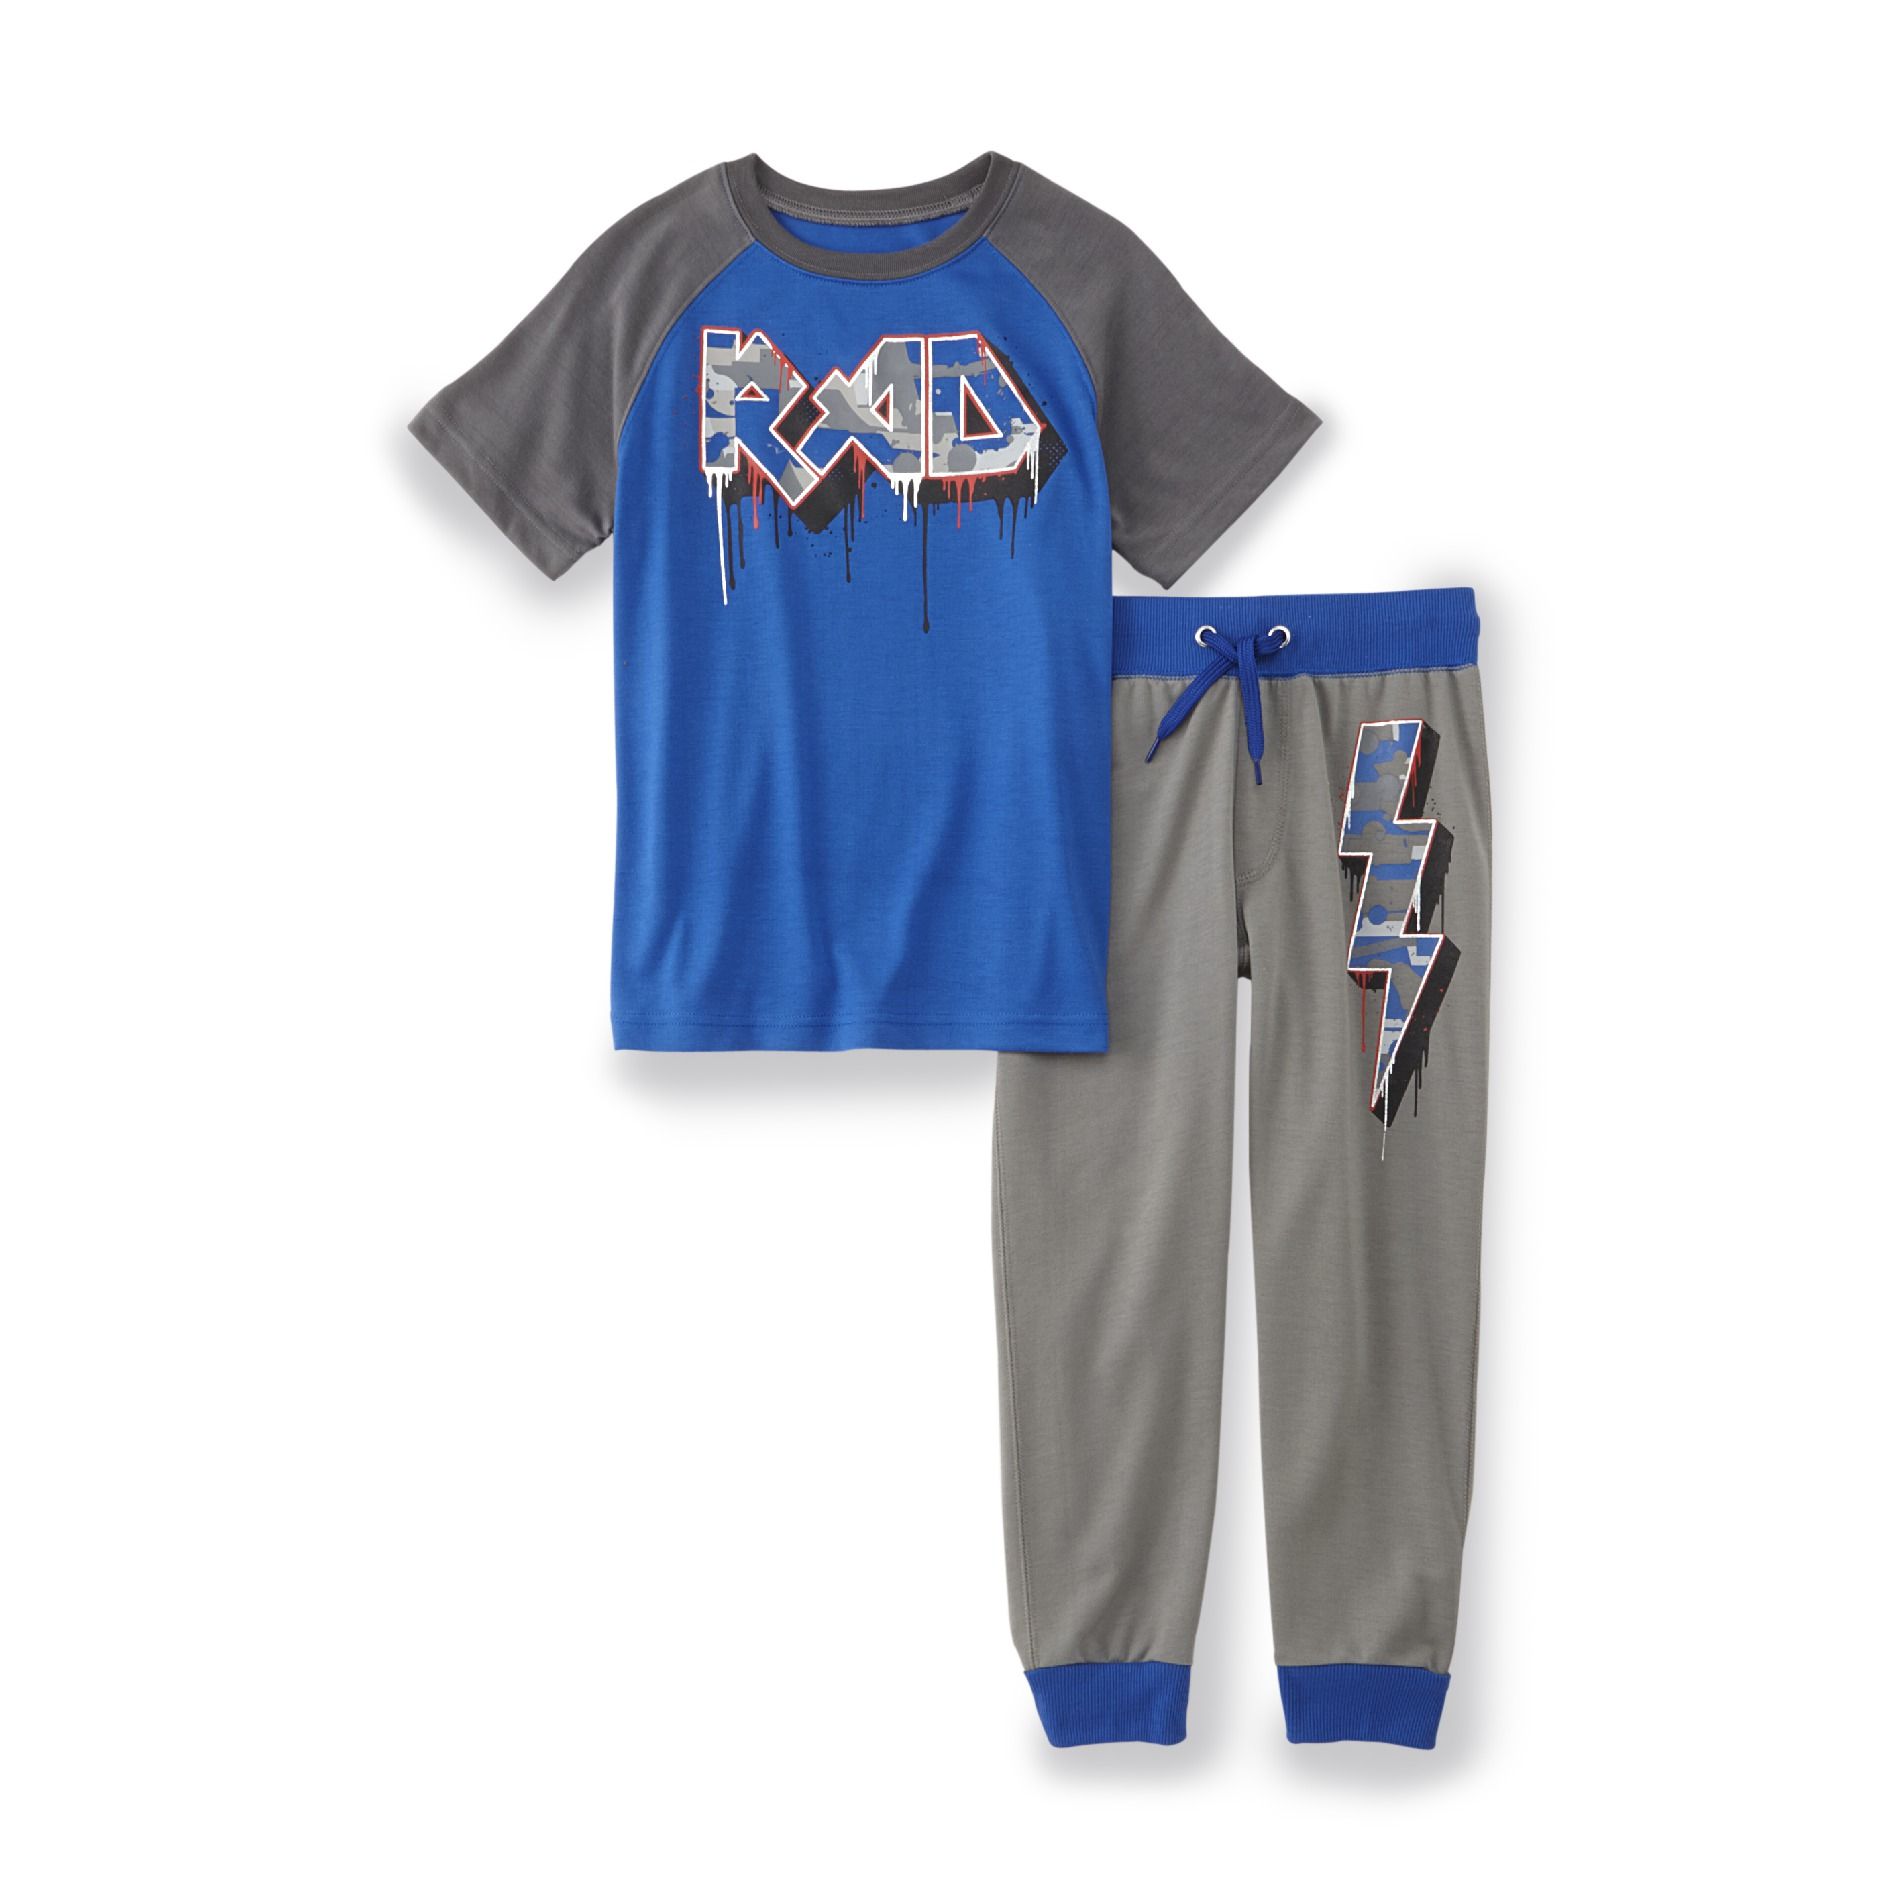 Joe Boxer Boy's Pajama T-Shirt & Pants - Rad